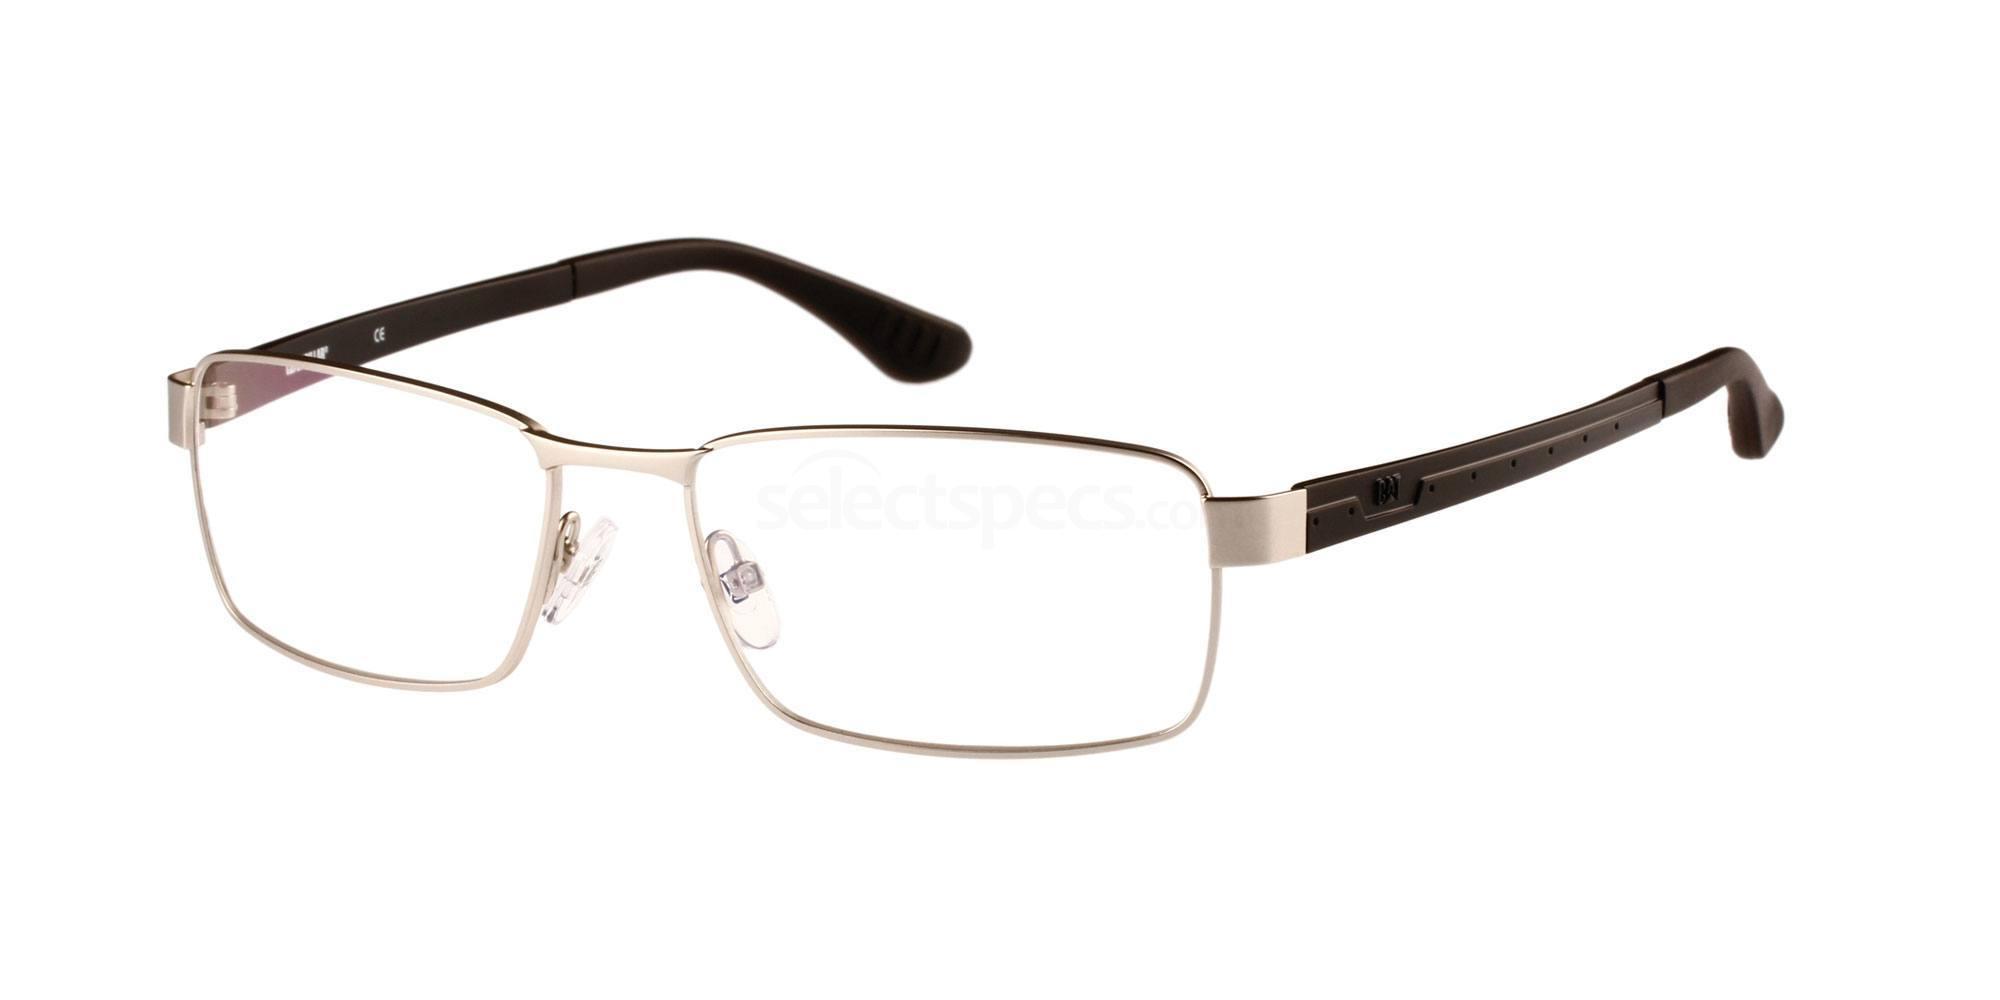 002 CTO J03 Glasses, CAT